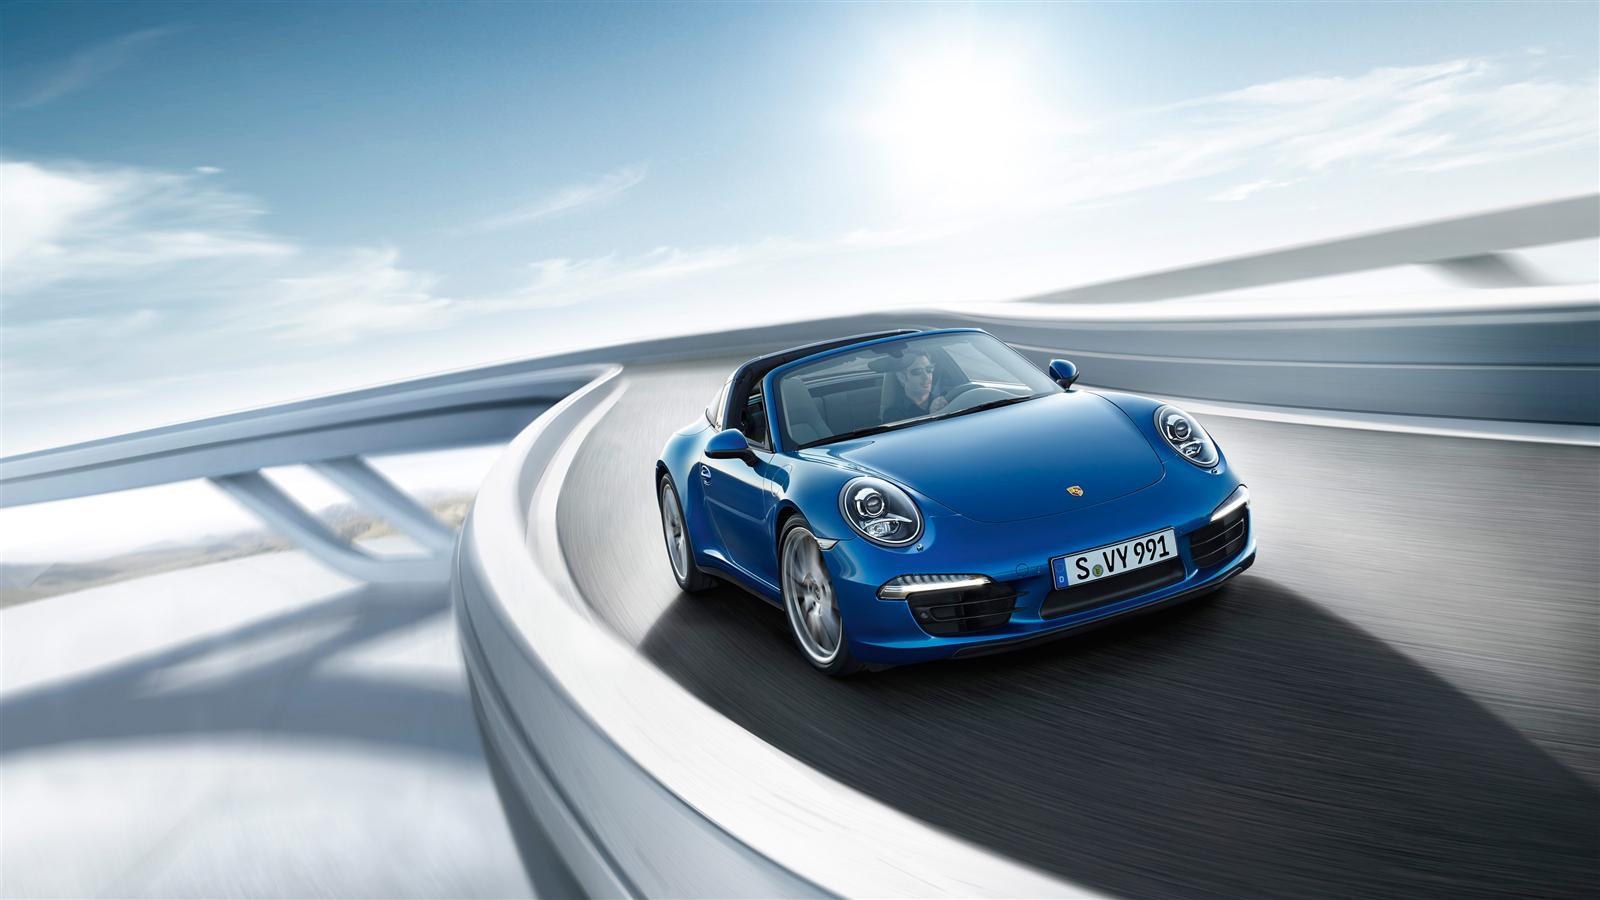 Porsche Makes More Money Per Car Than Audi, Bentley, Or Lamborghini